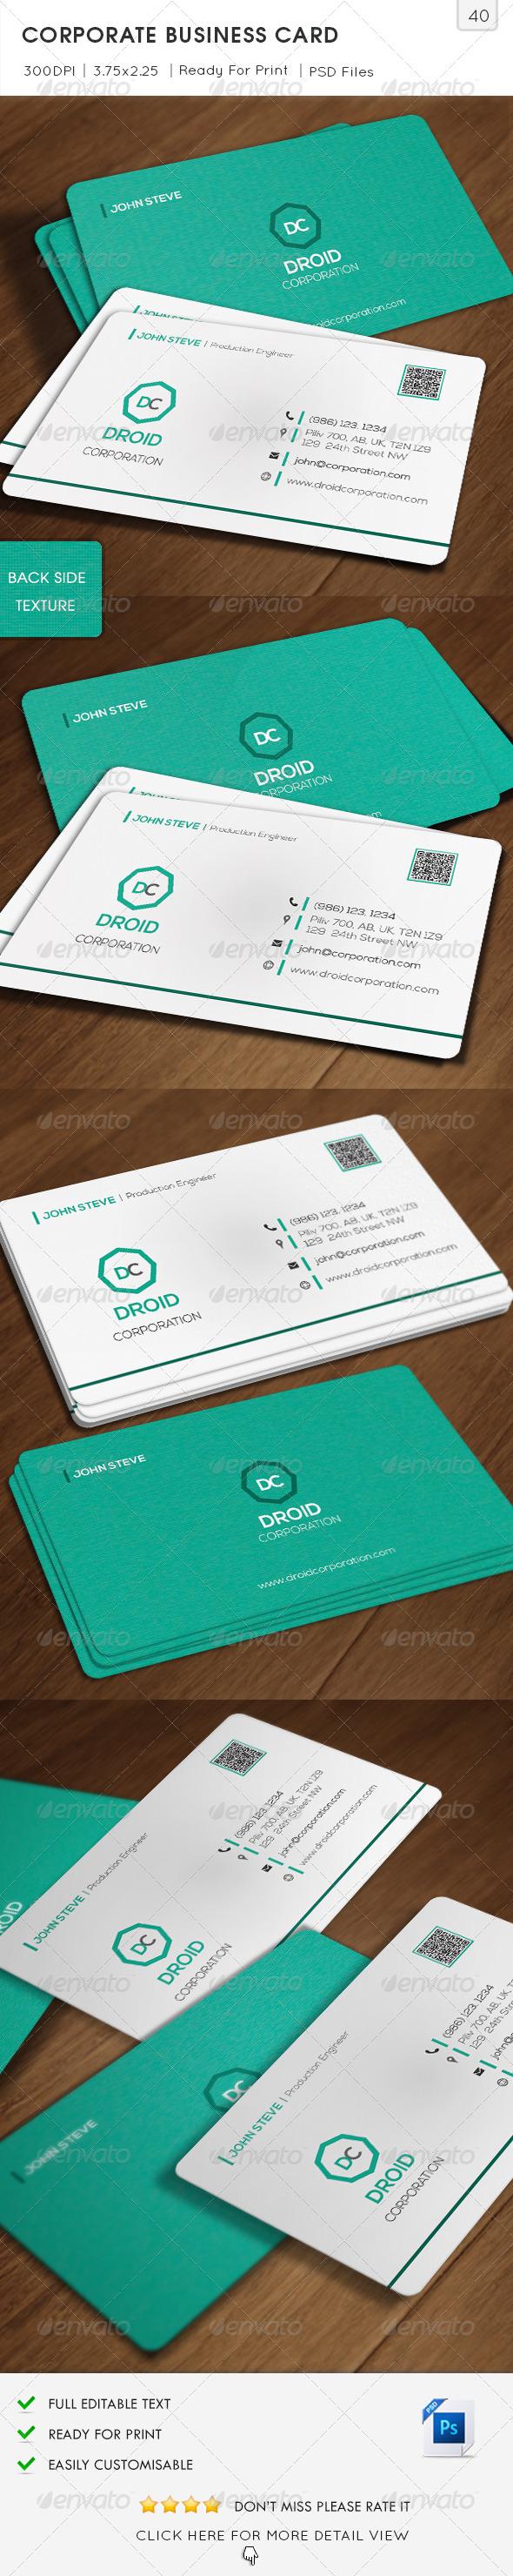 Corporate Business Card v40 - Corporate Business Cards